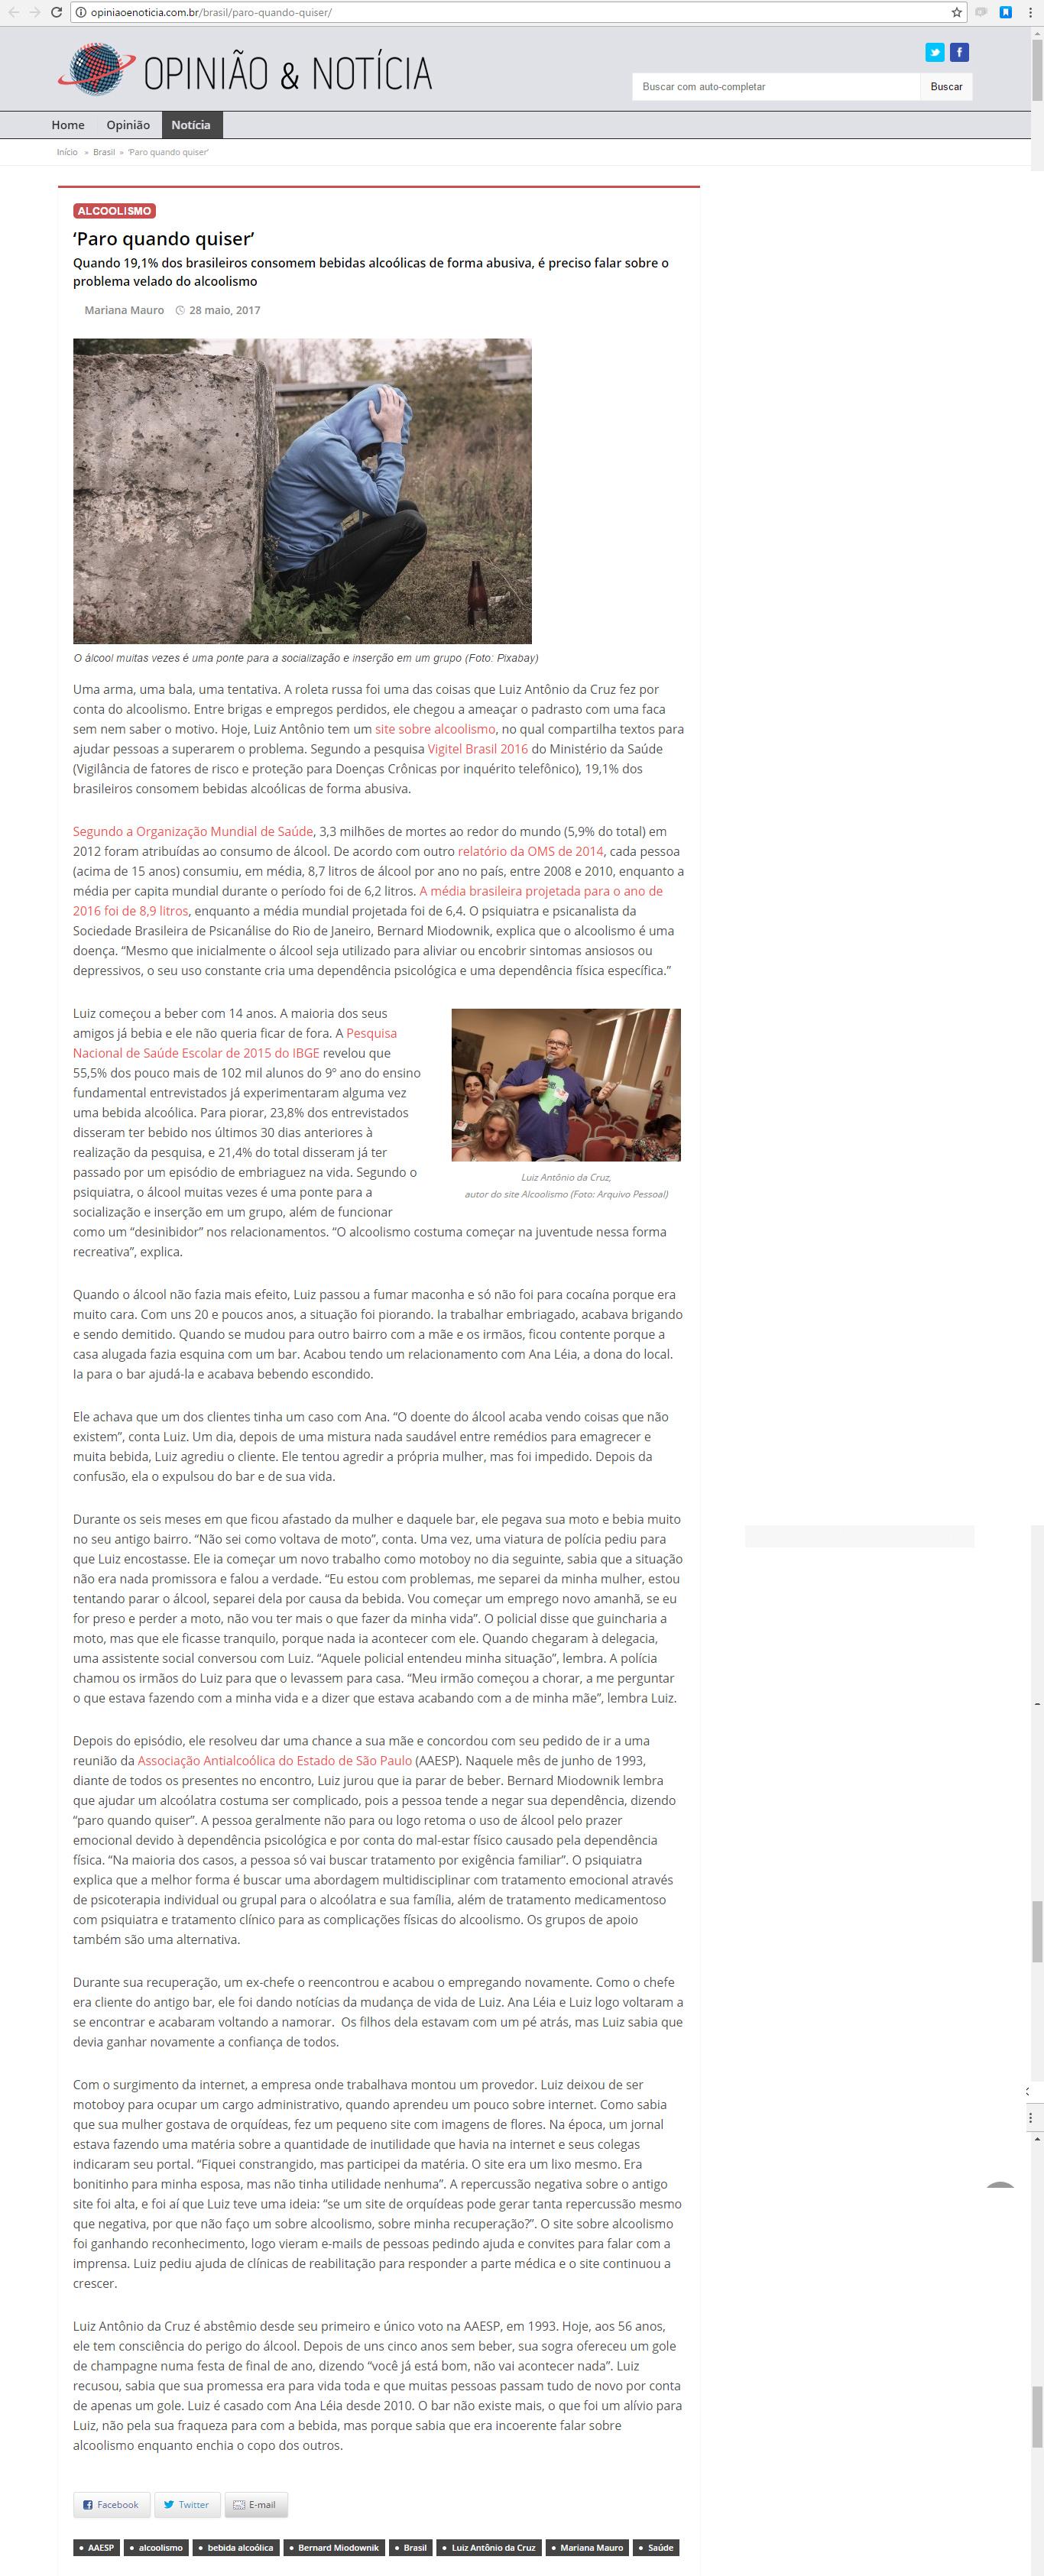 Opinião & Notícia